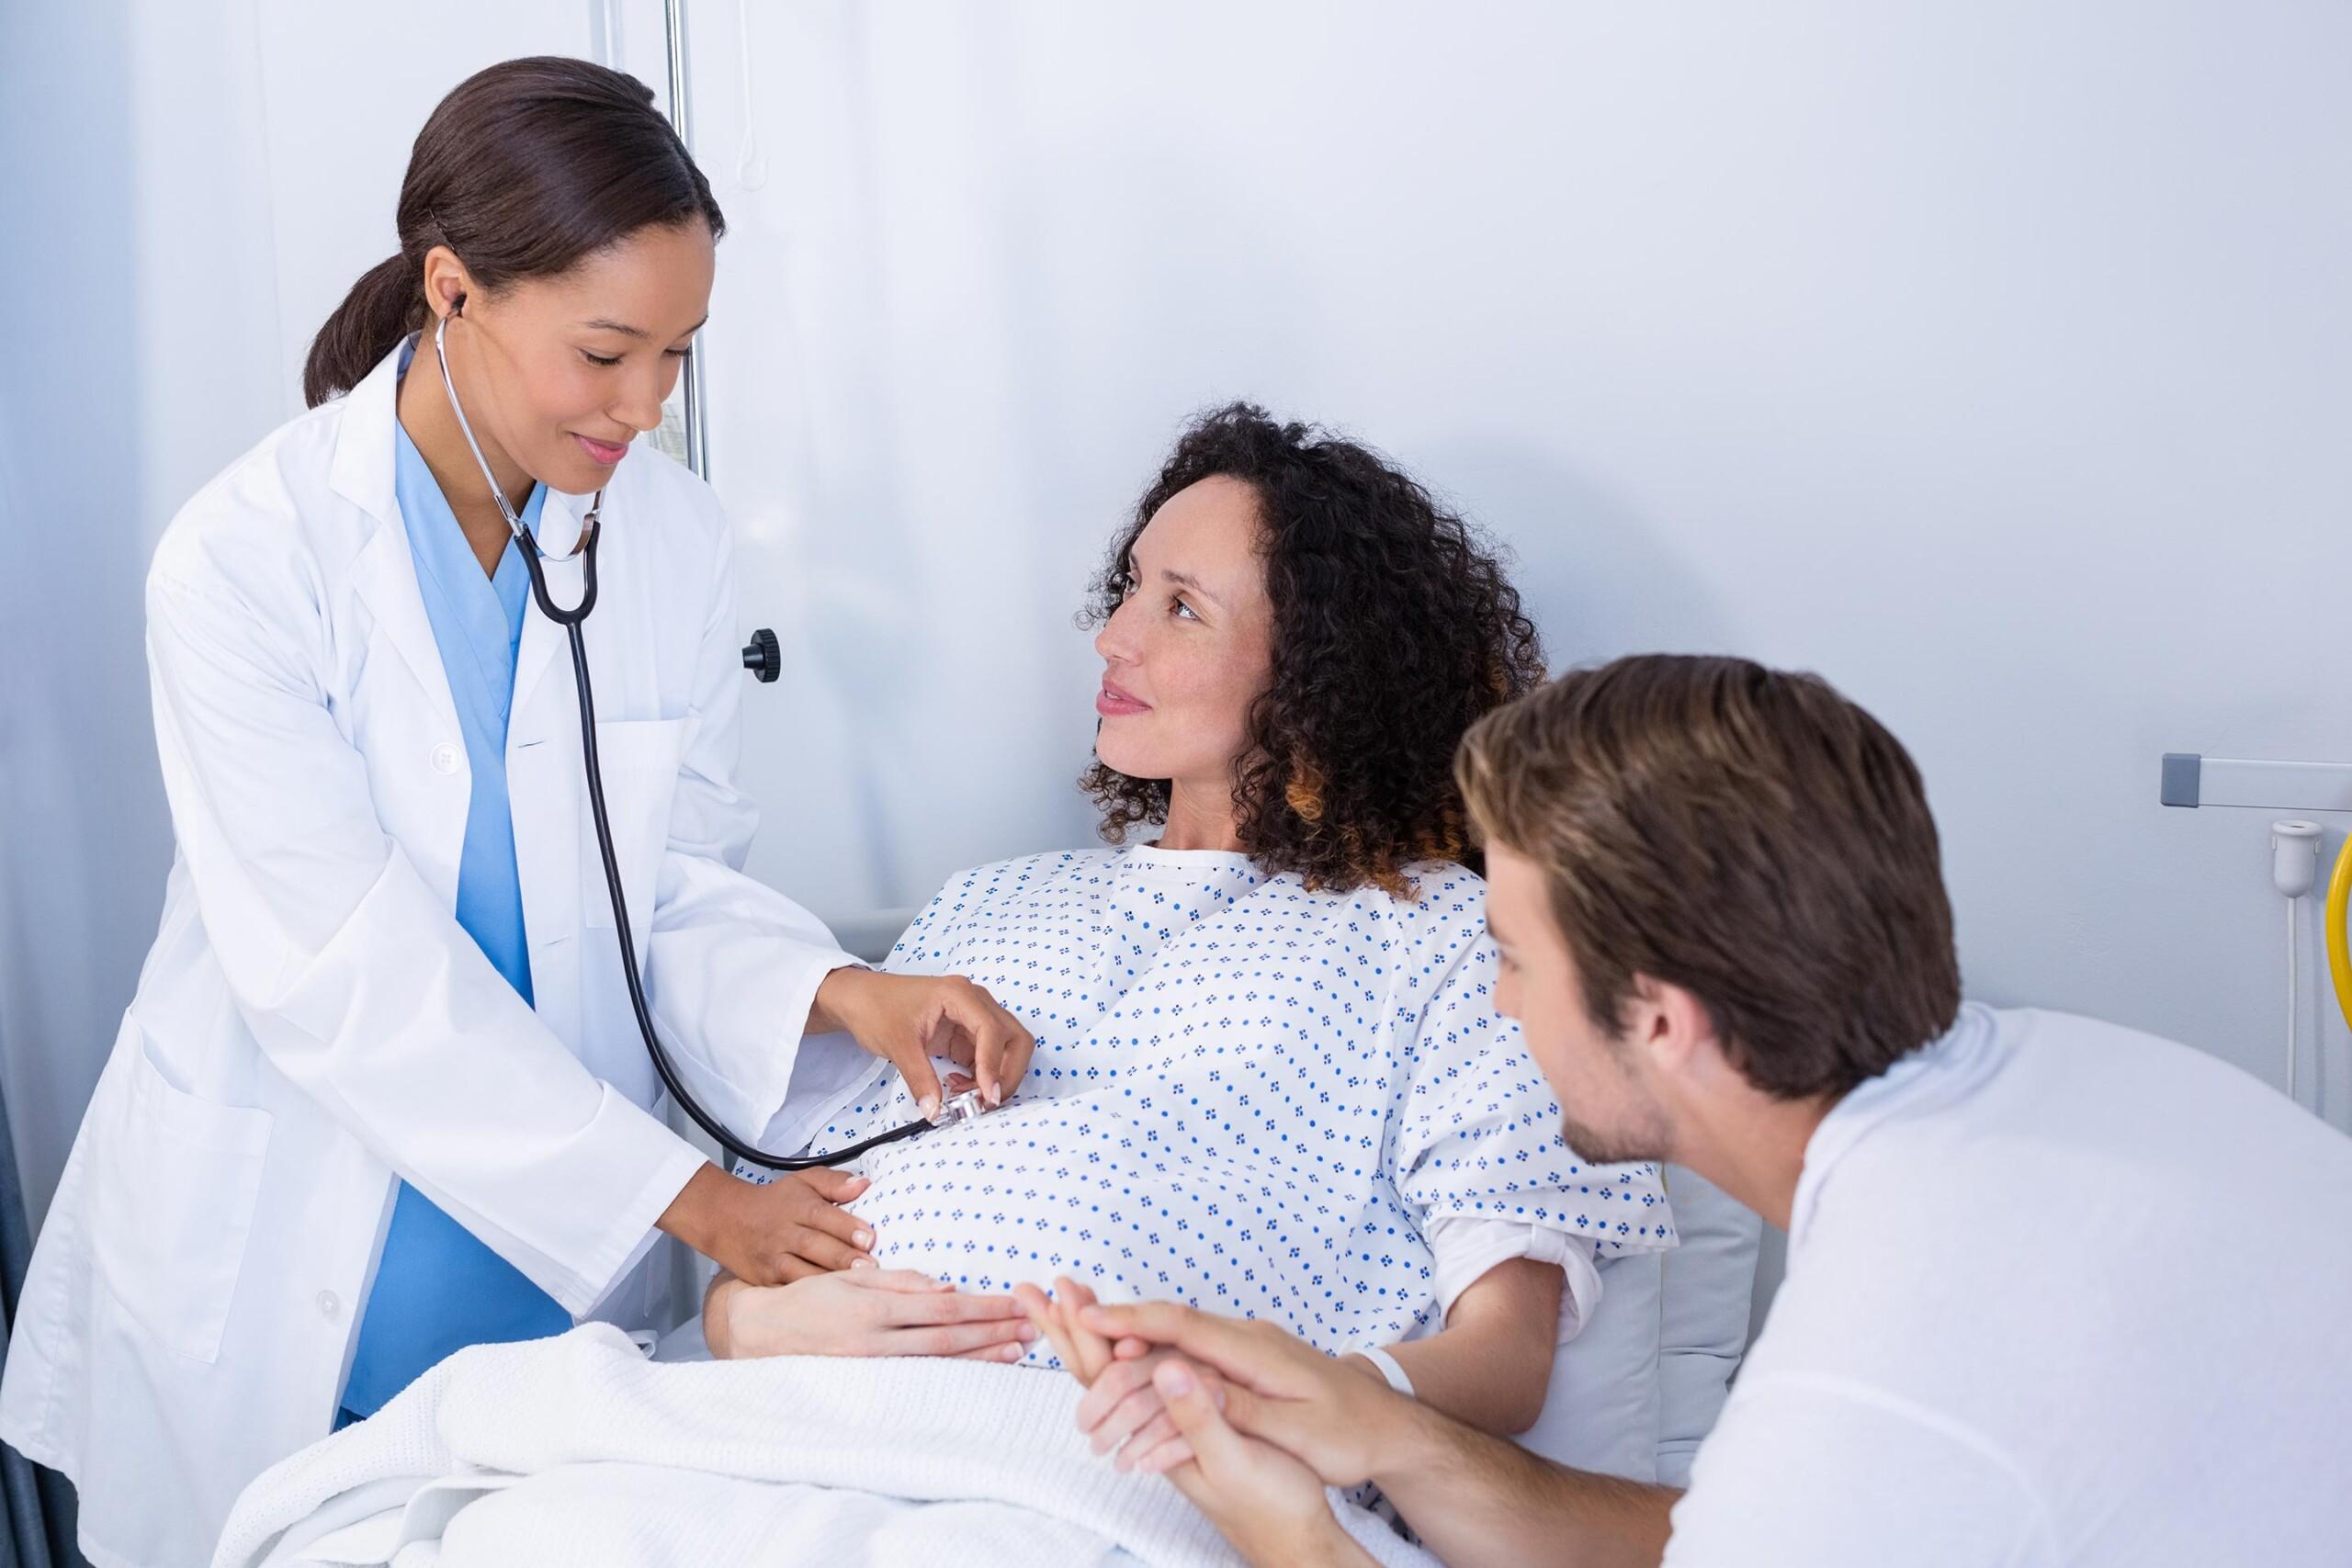 Co spakować do szpitala na poród?